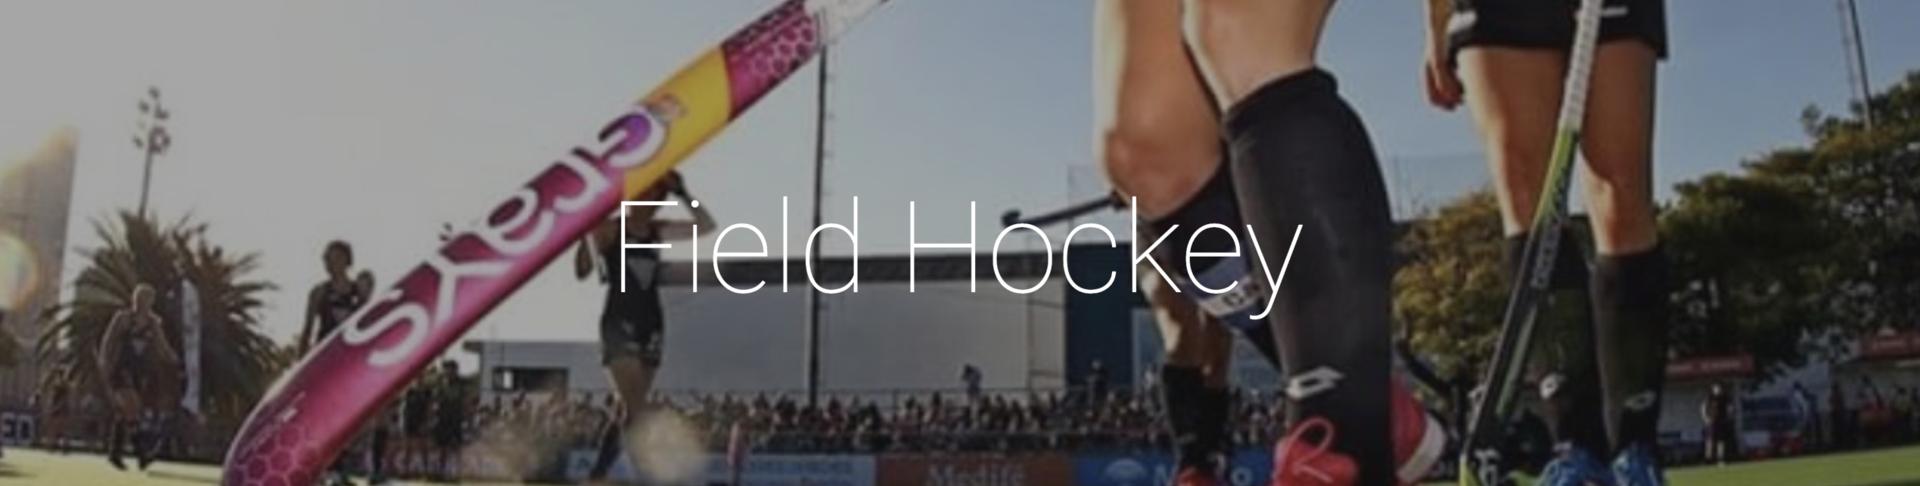 Field Hockey Image